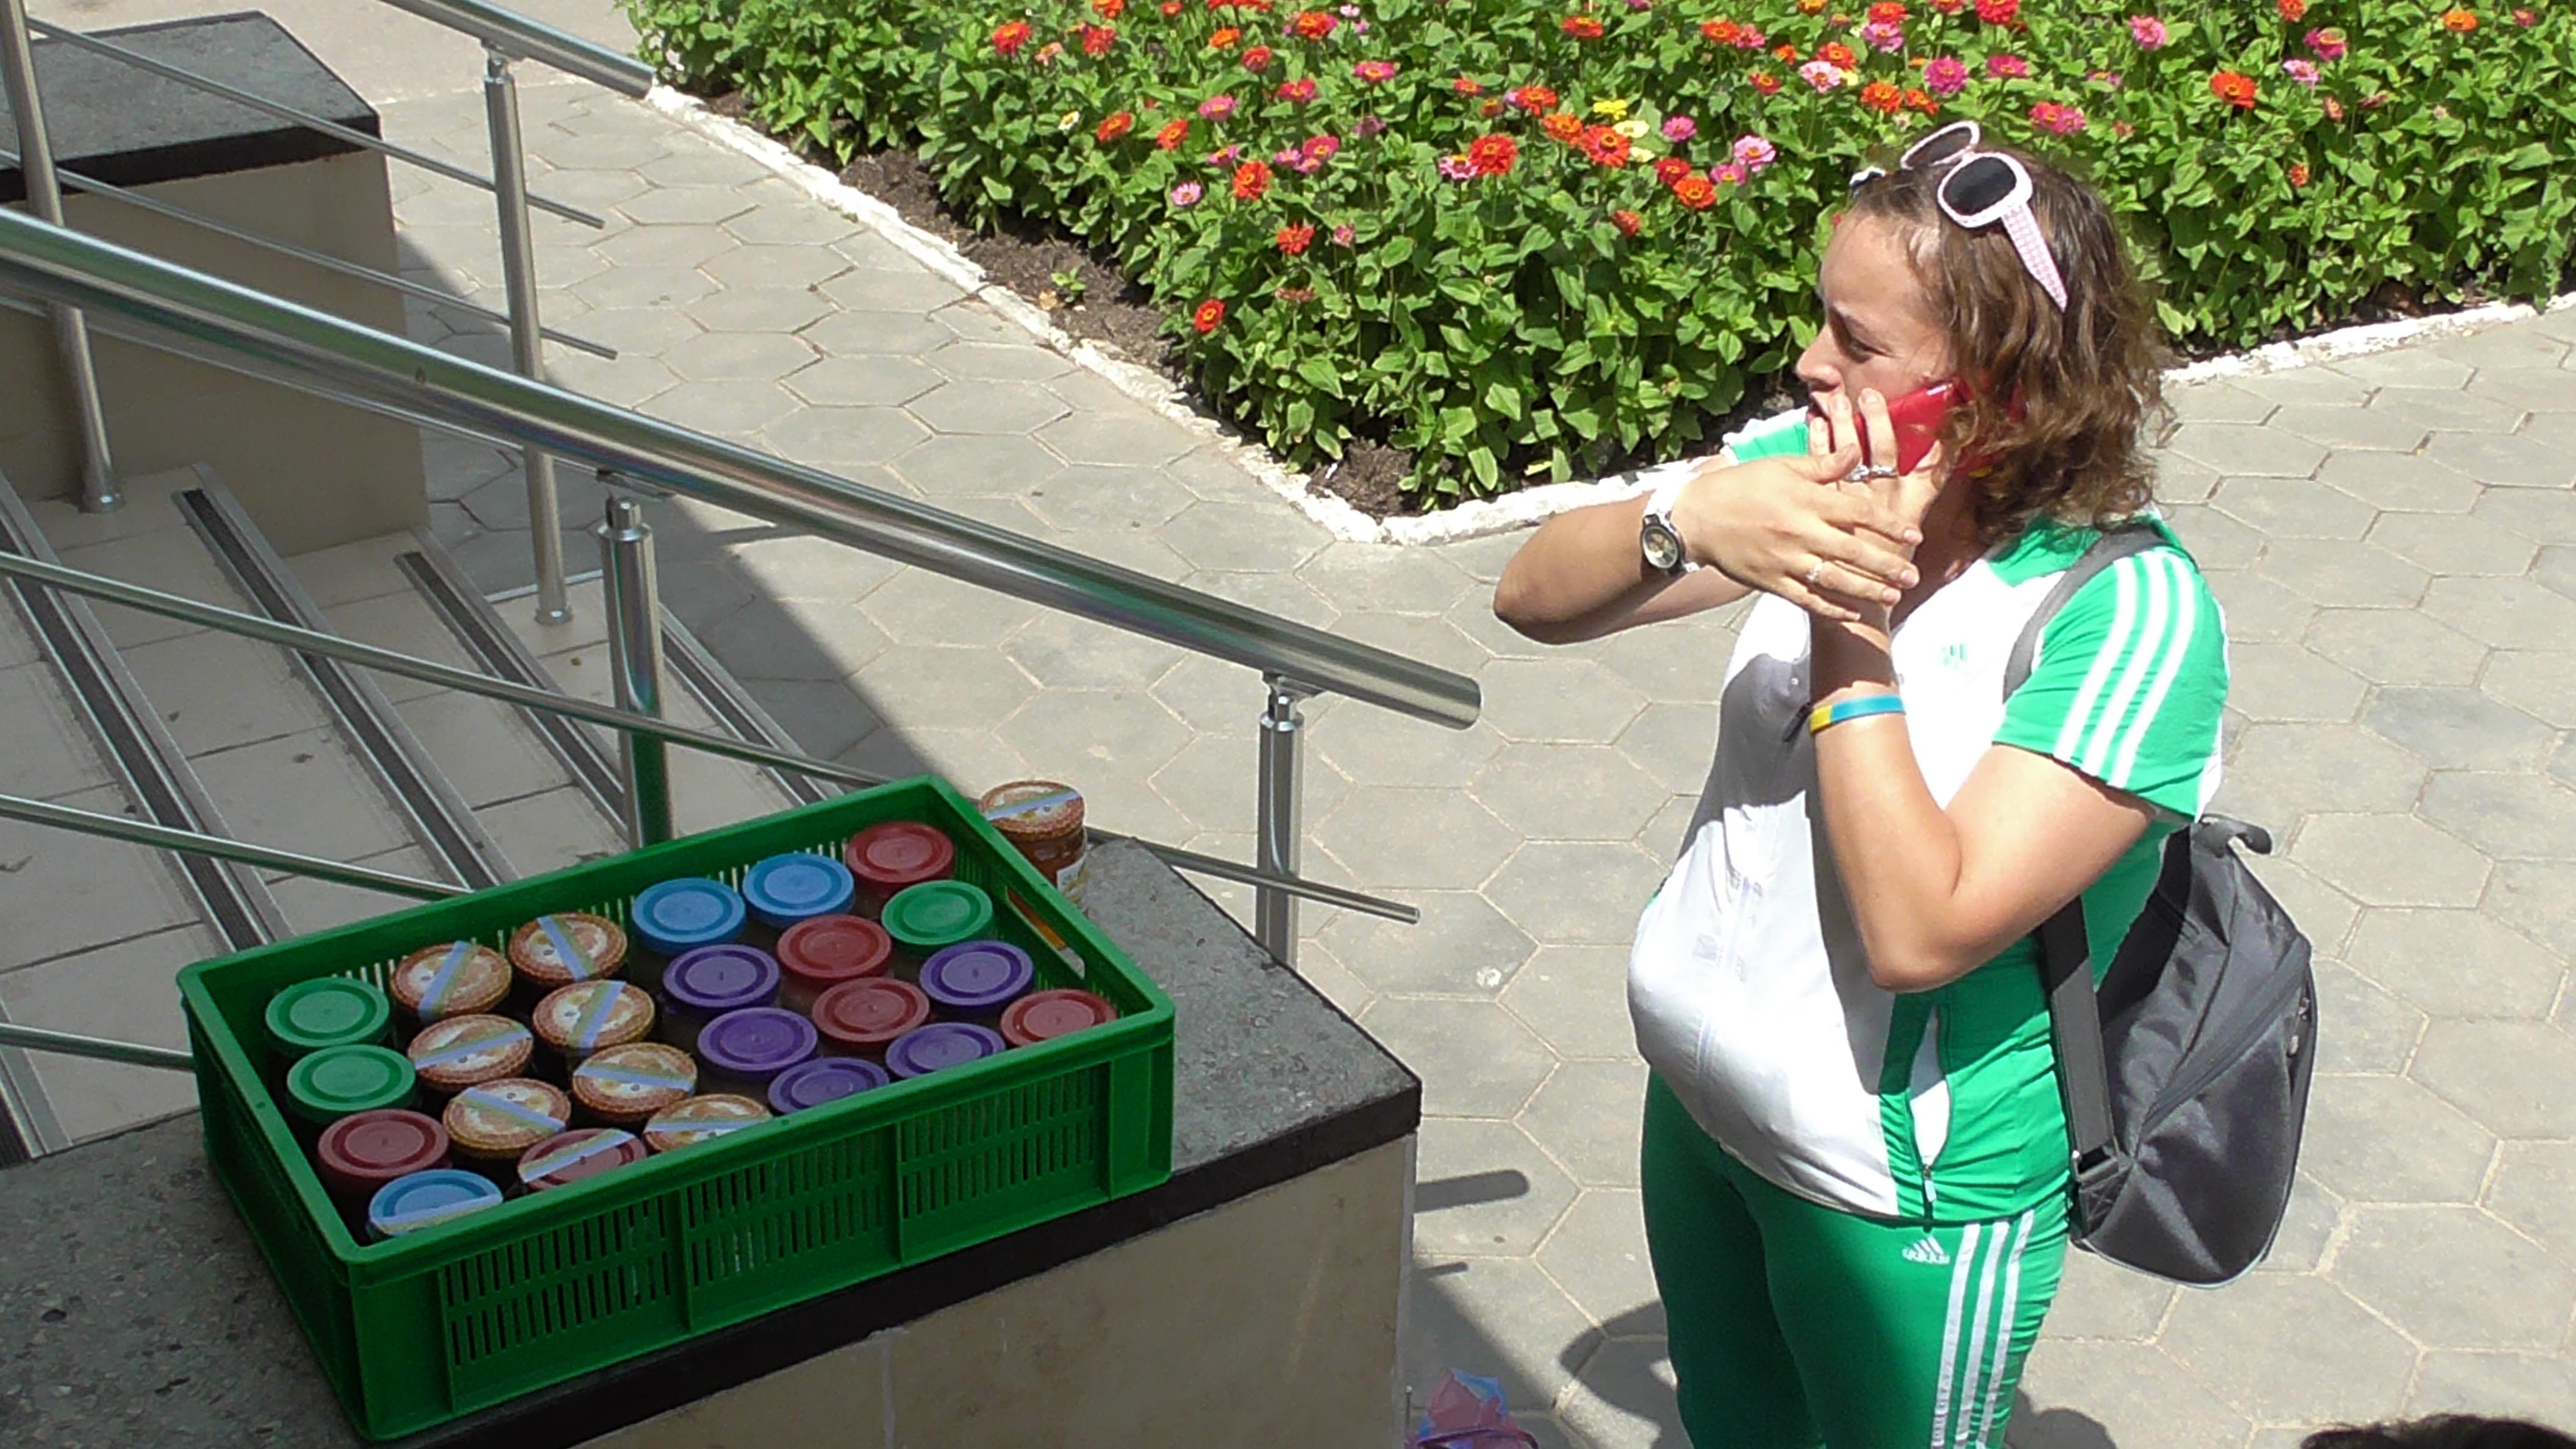 Українське ххх відео 26 фотография